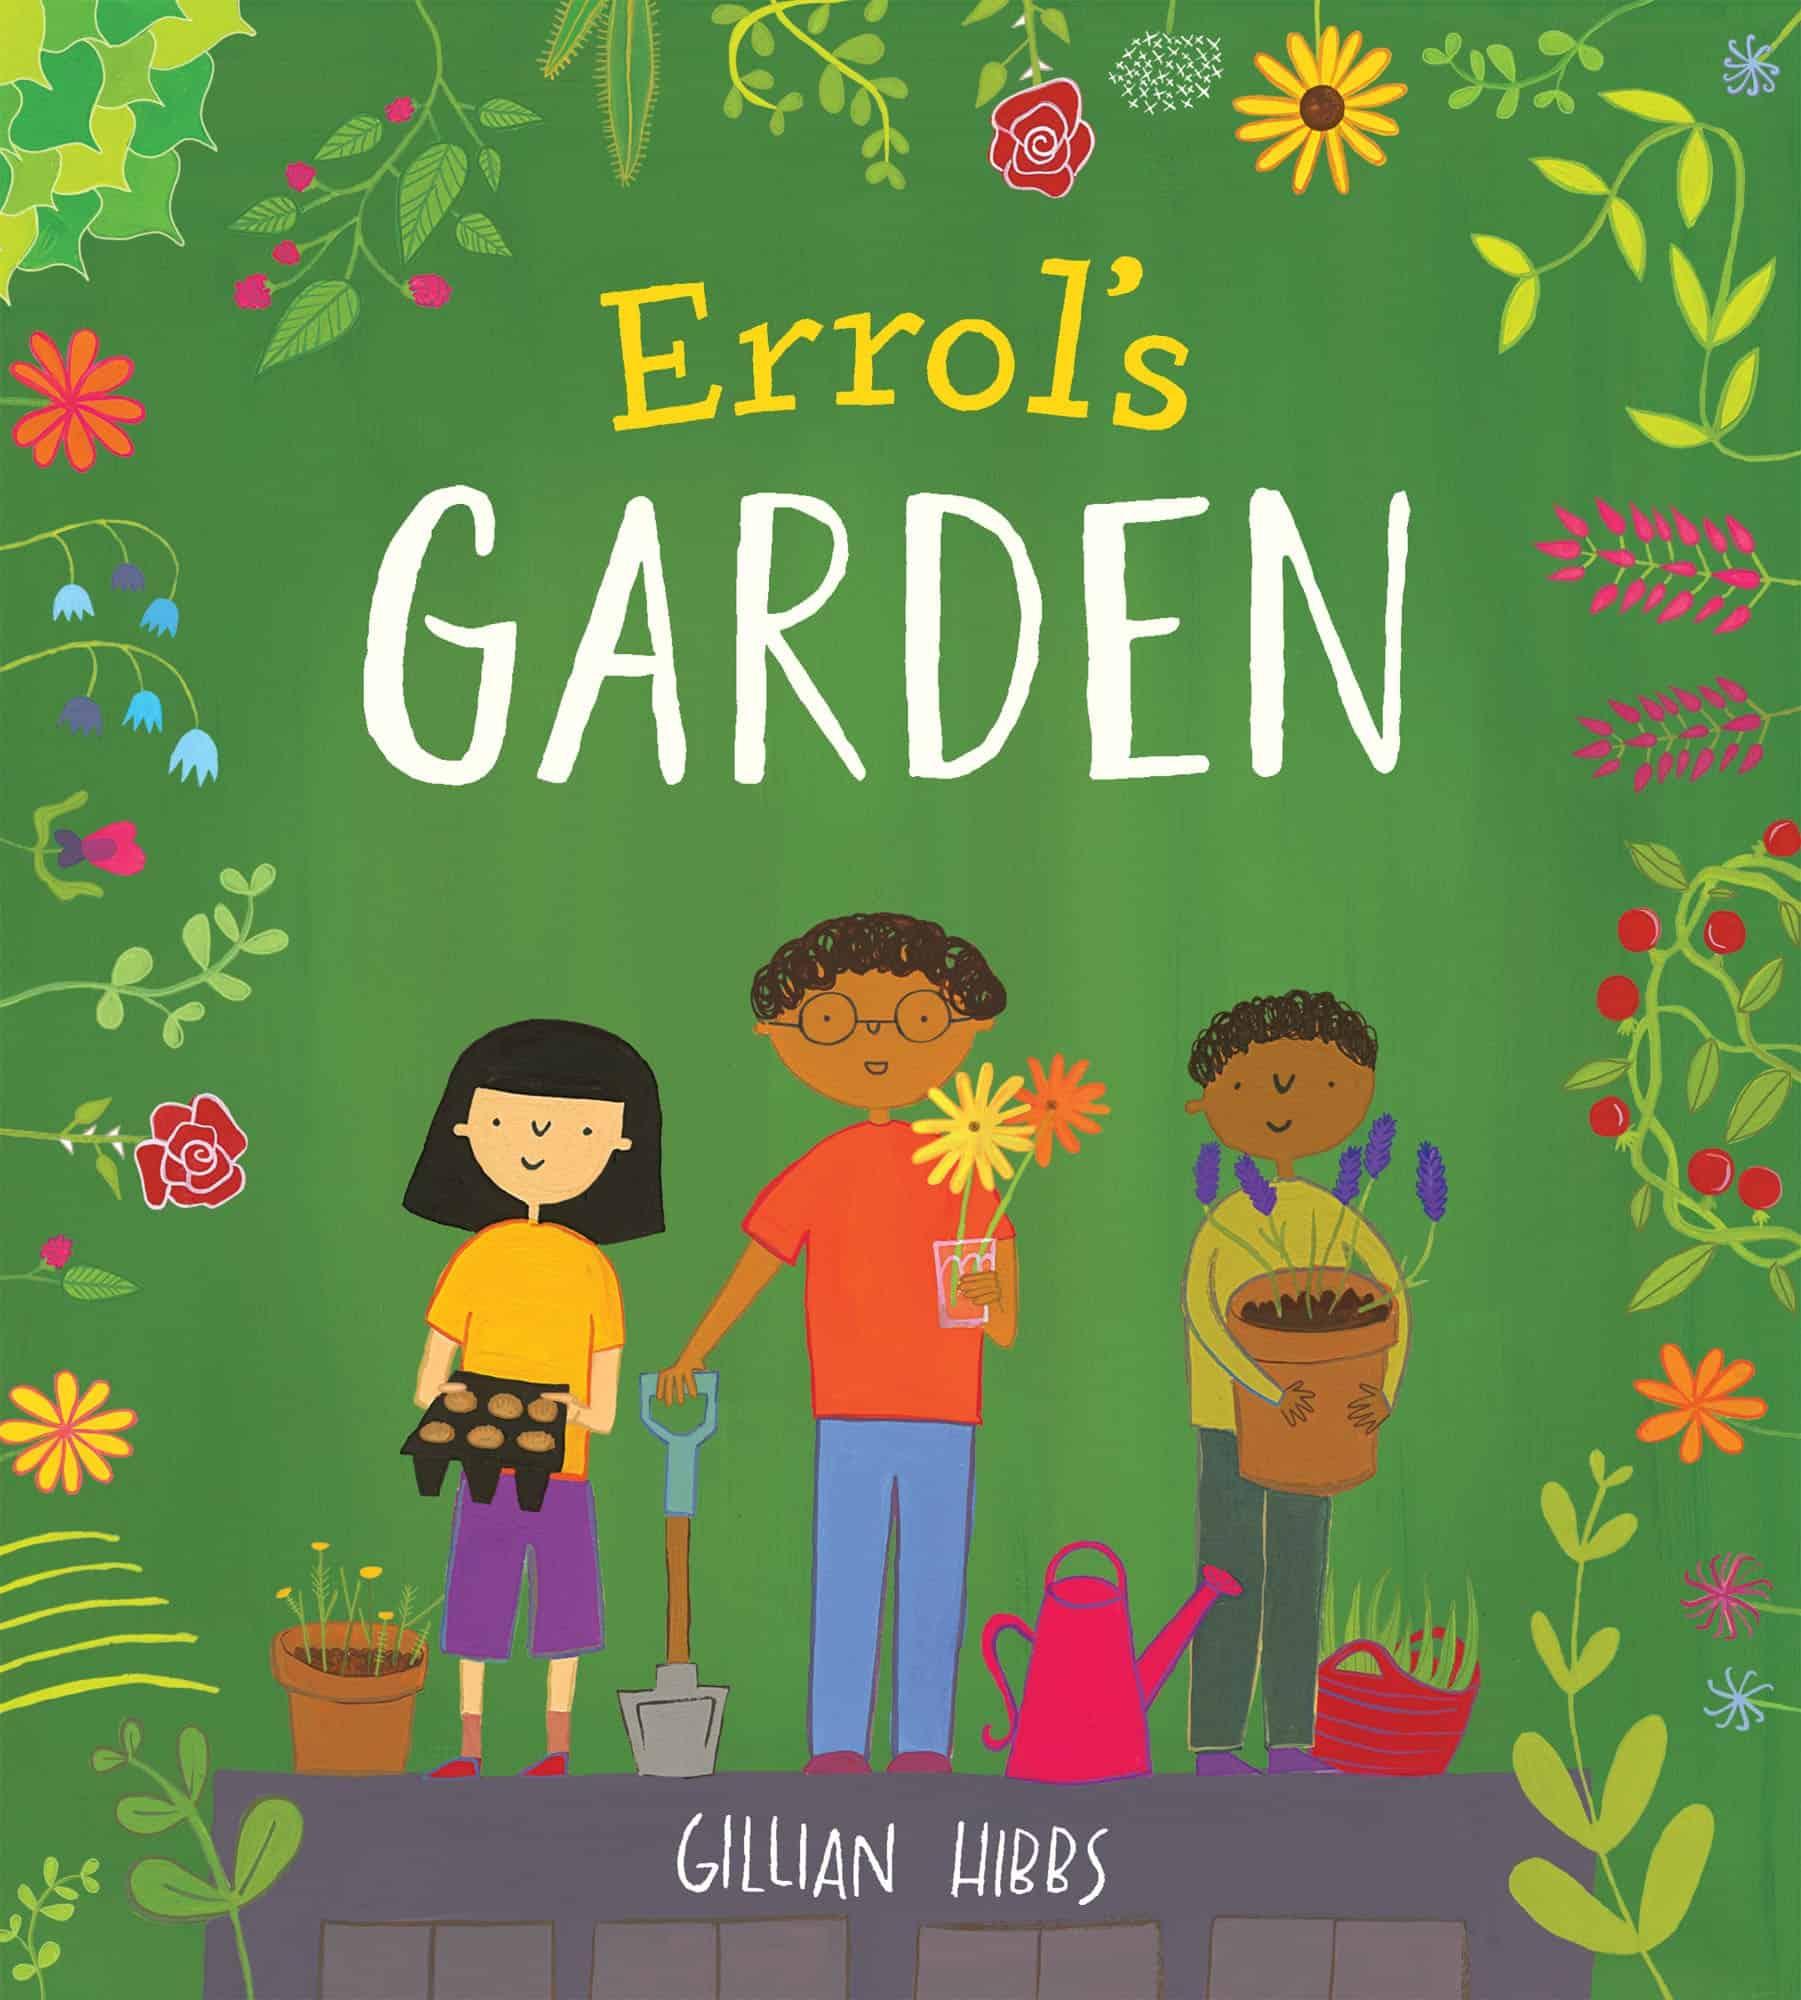 4. Errols Garden